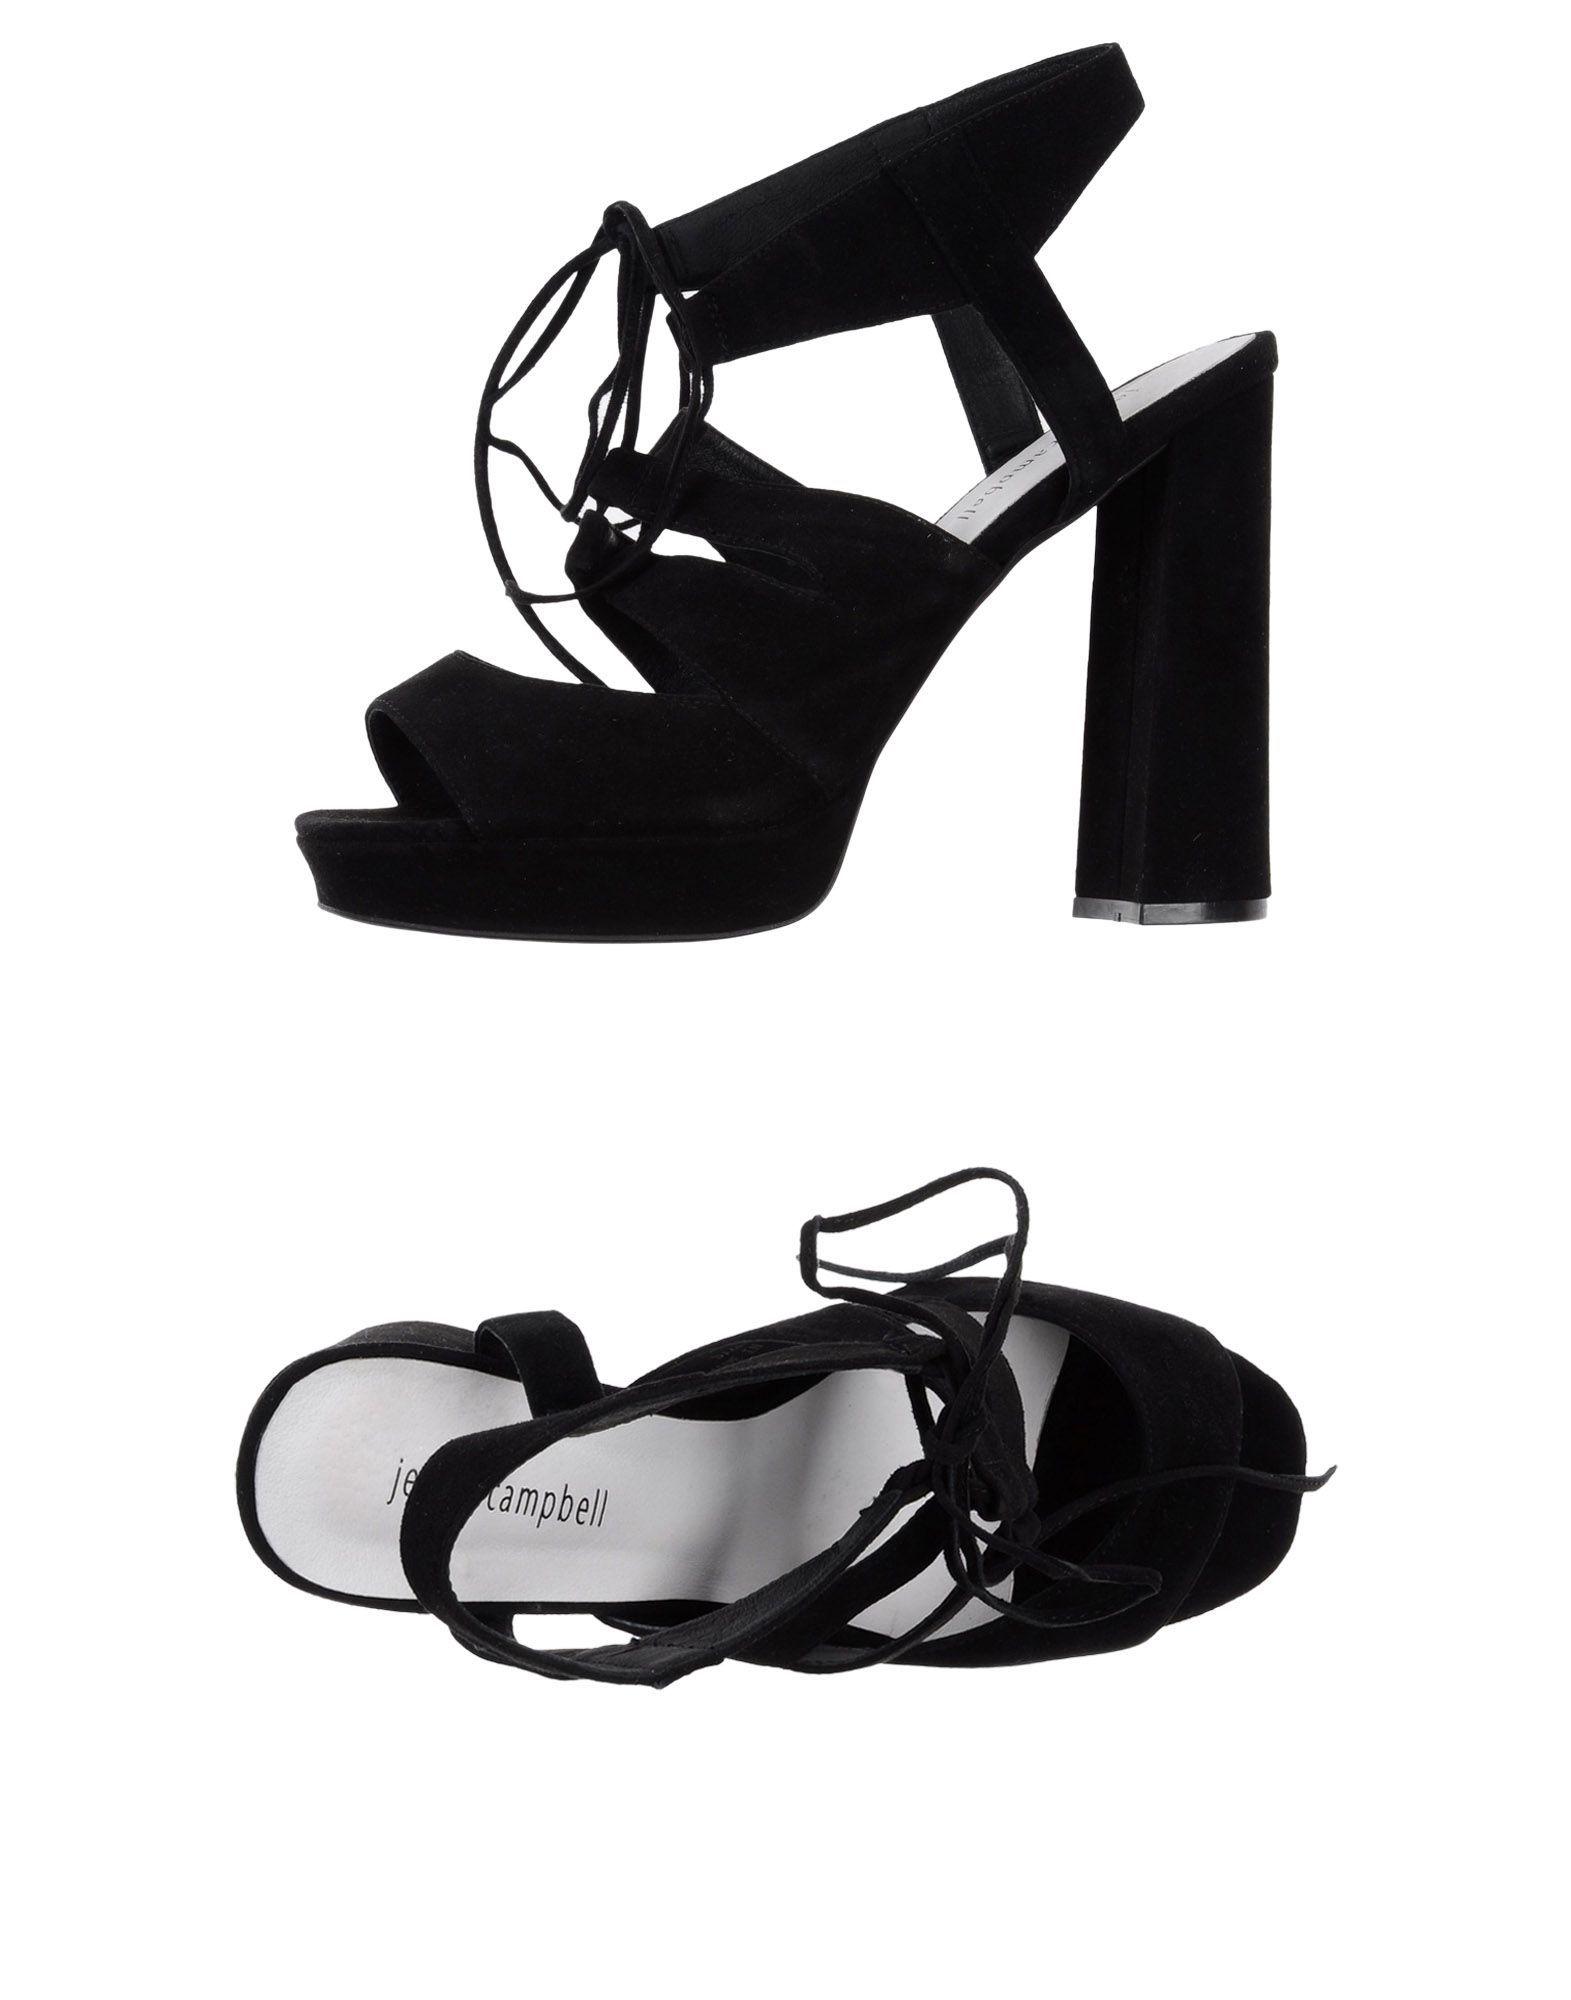 Jeffrey Campbell Black Leather Sandals